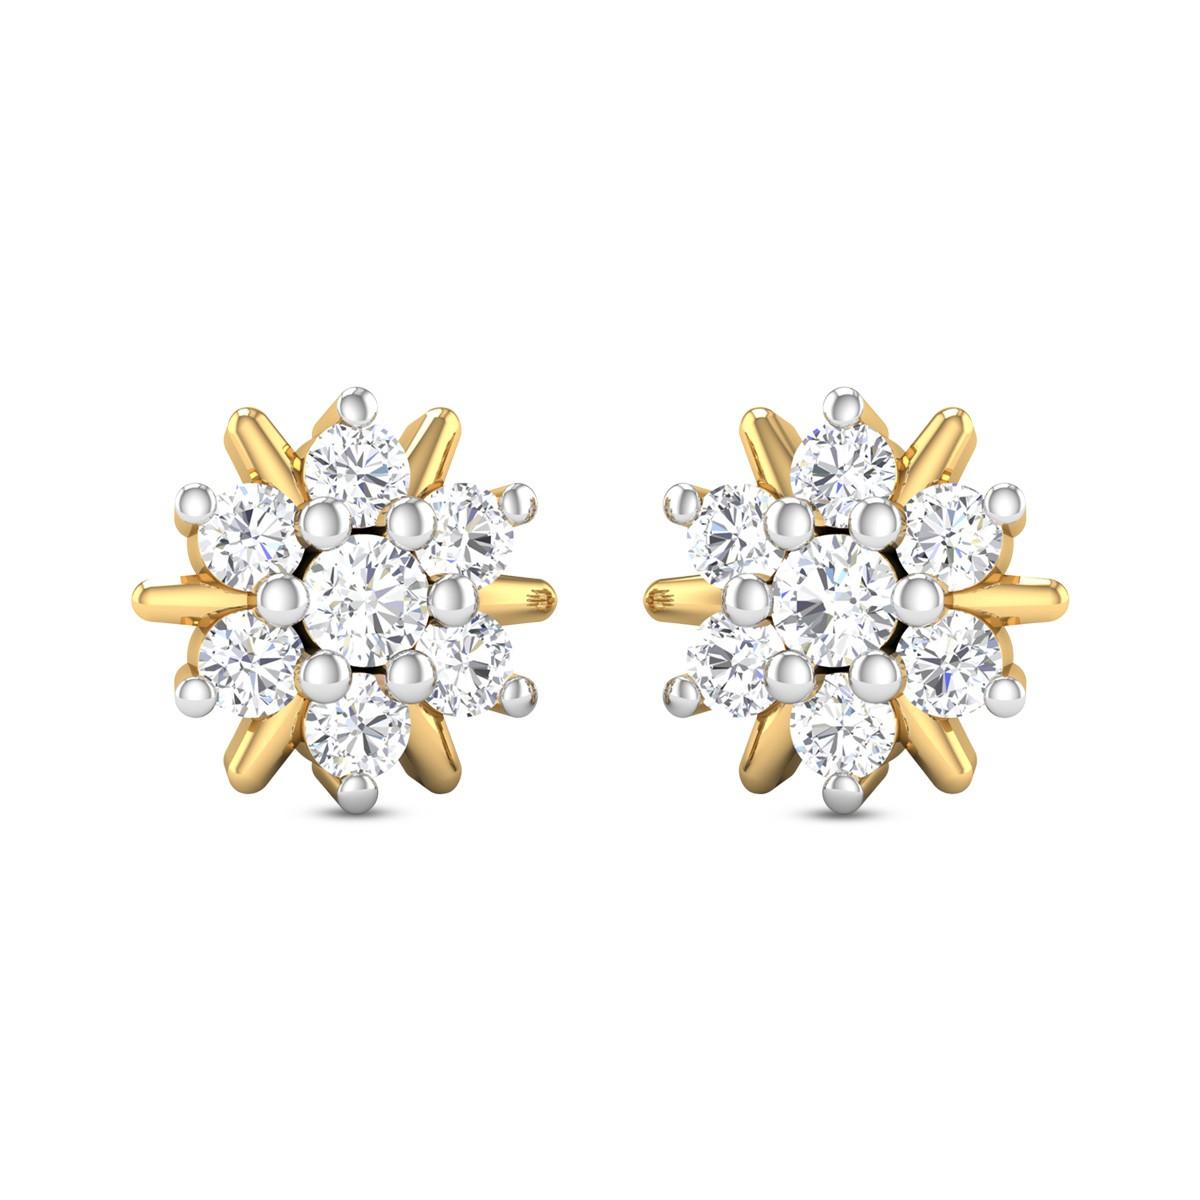 Riona Diamond Earrings